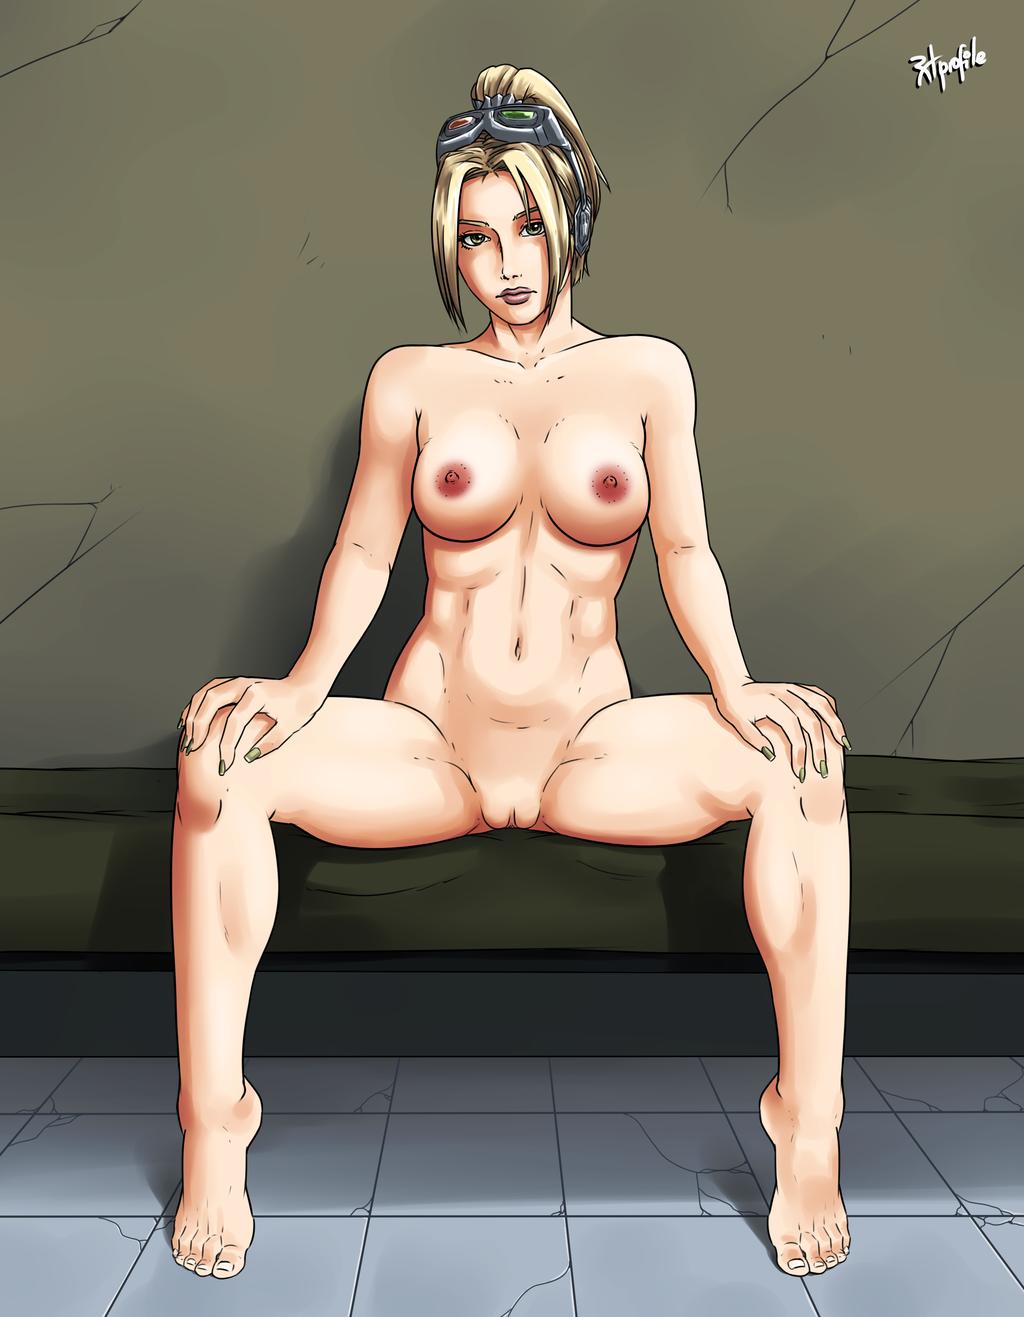 Starcraft-porn gallery porncraft images